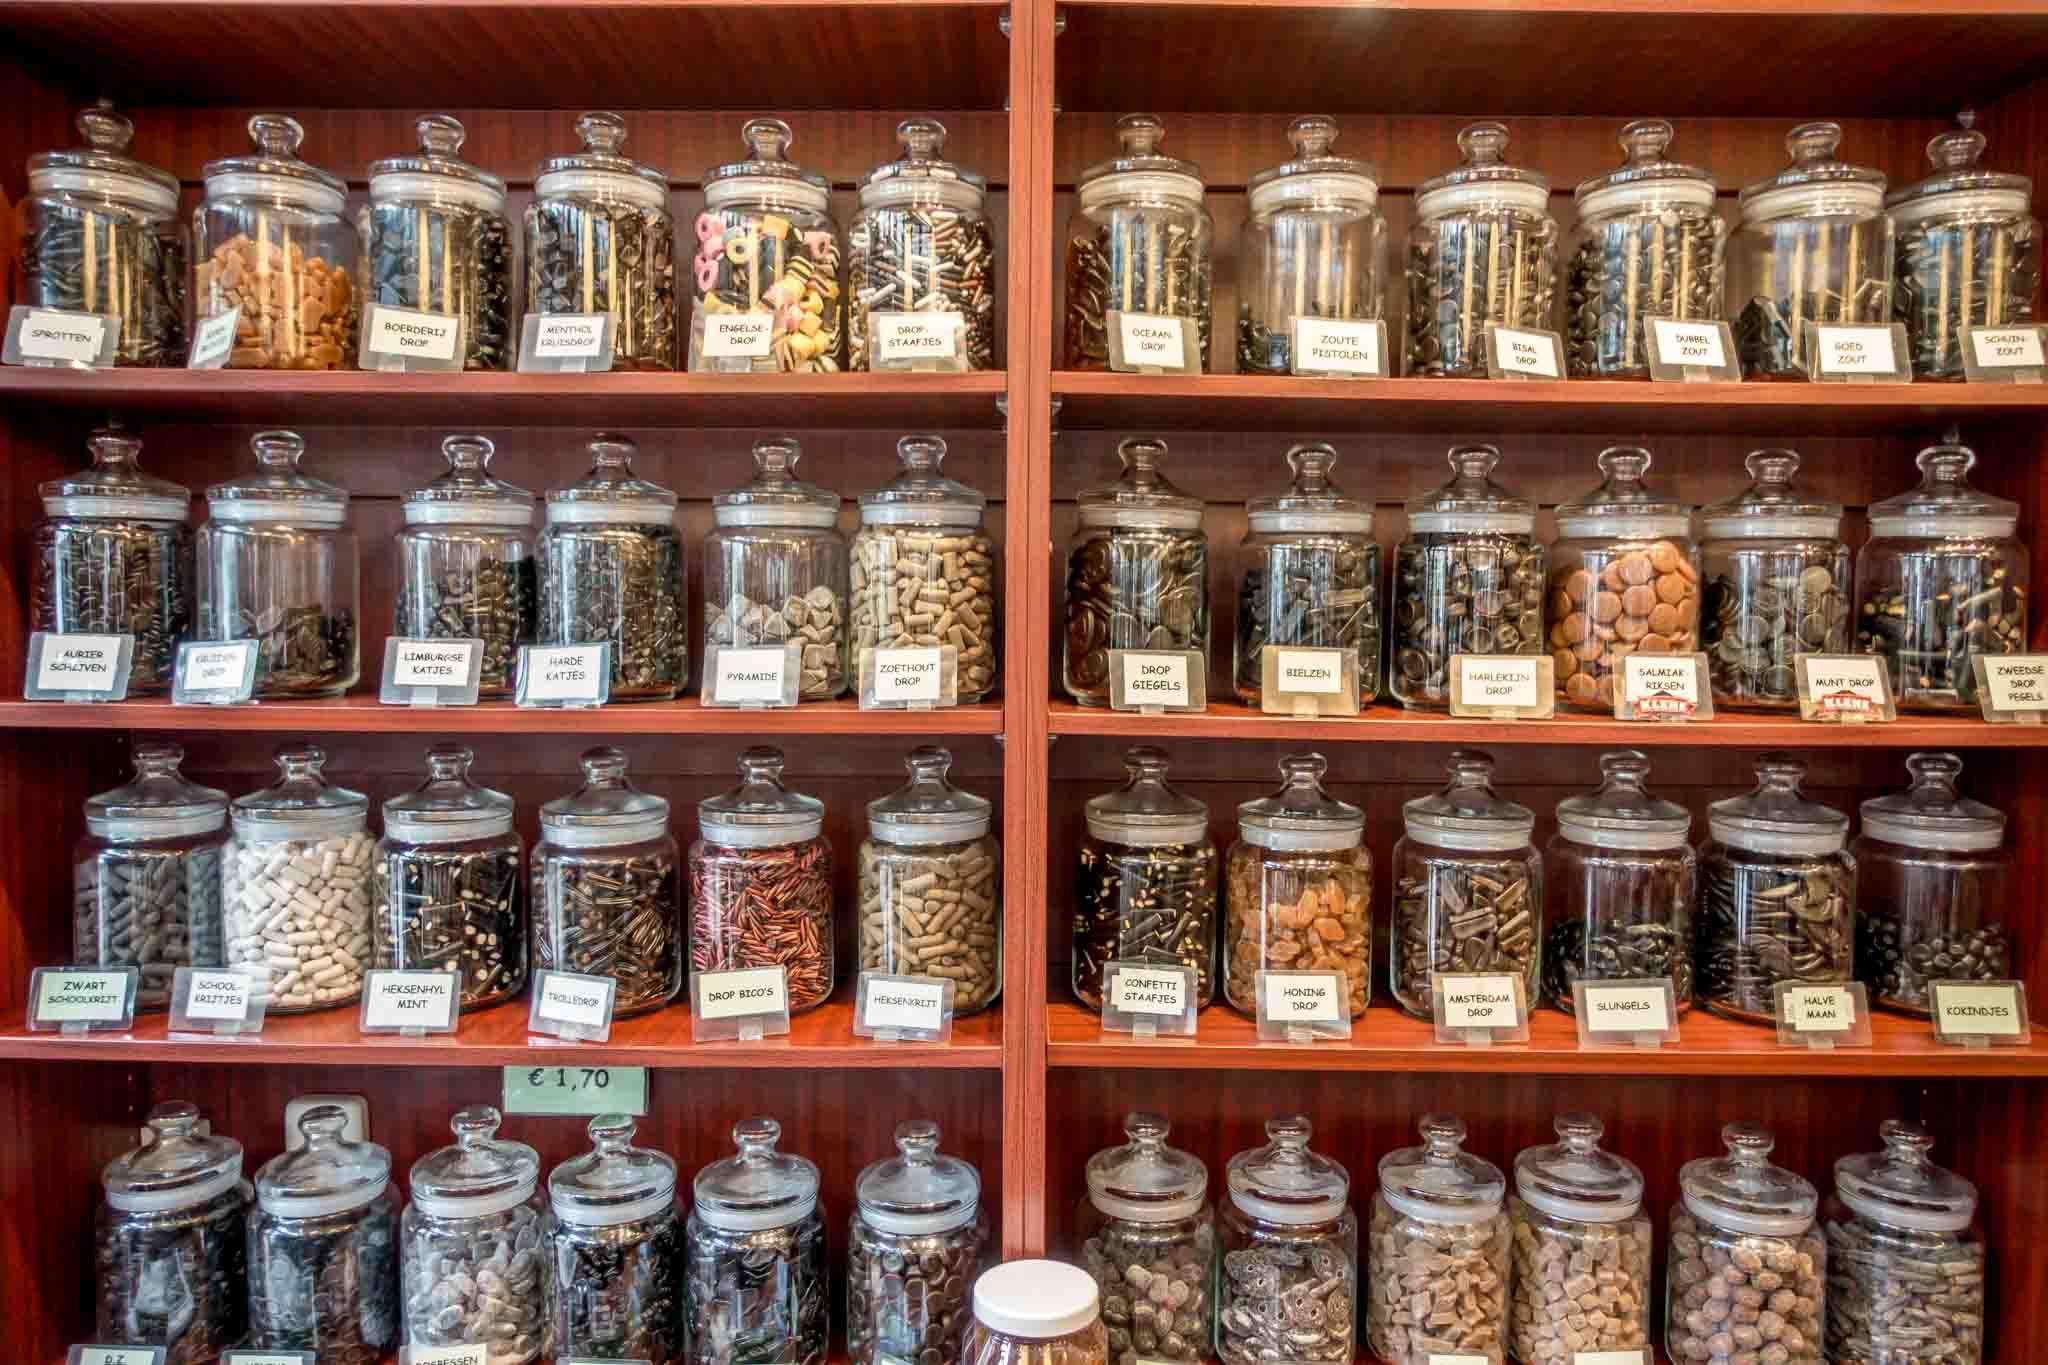 Jars of licorice